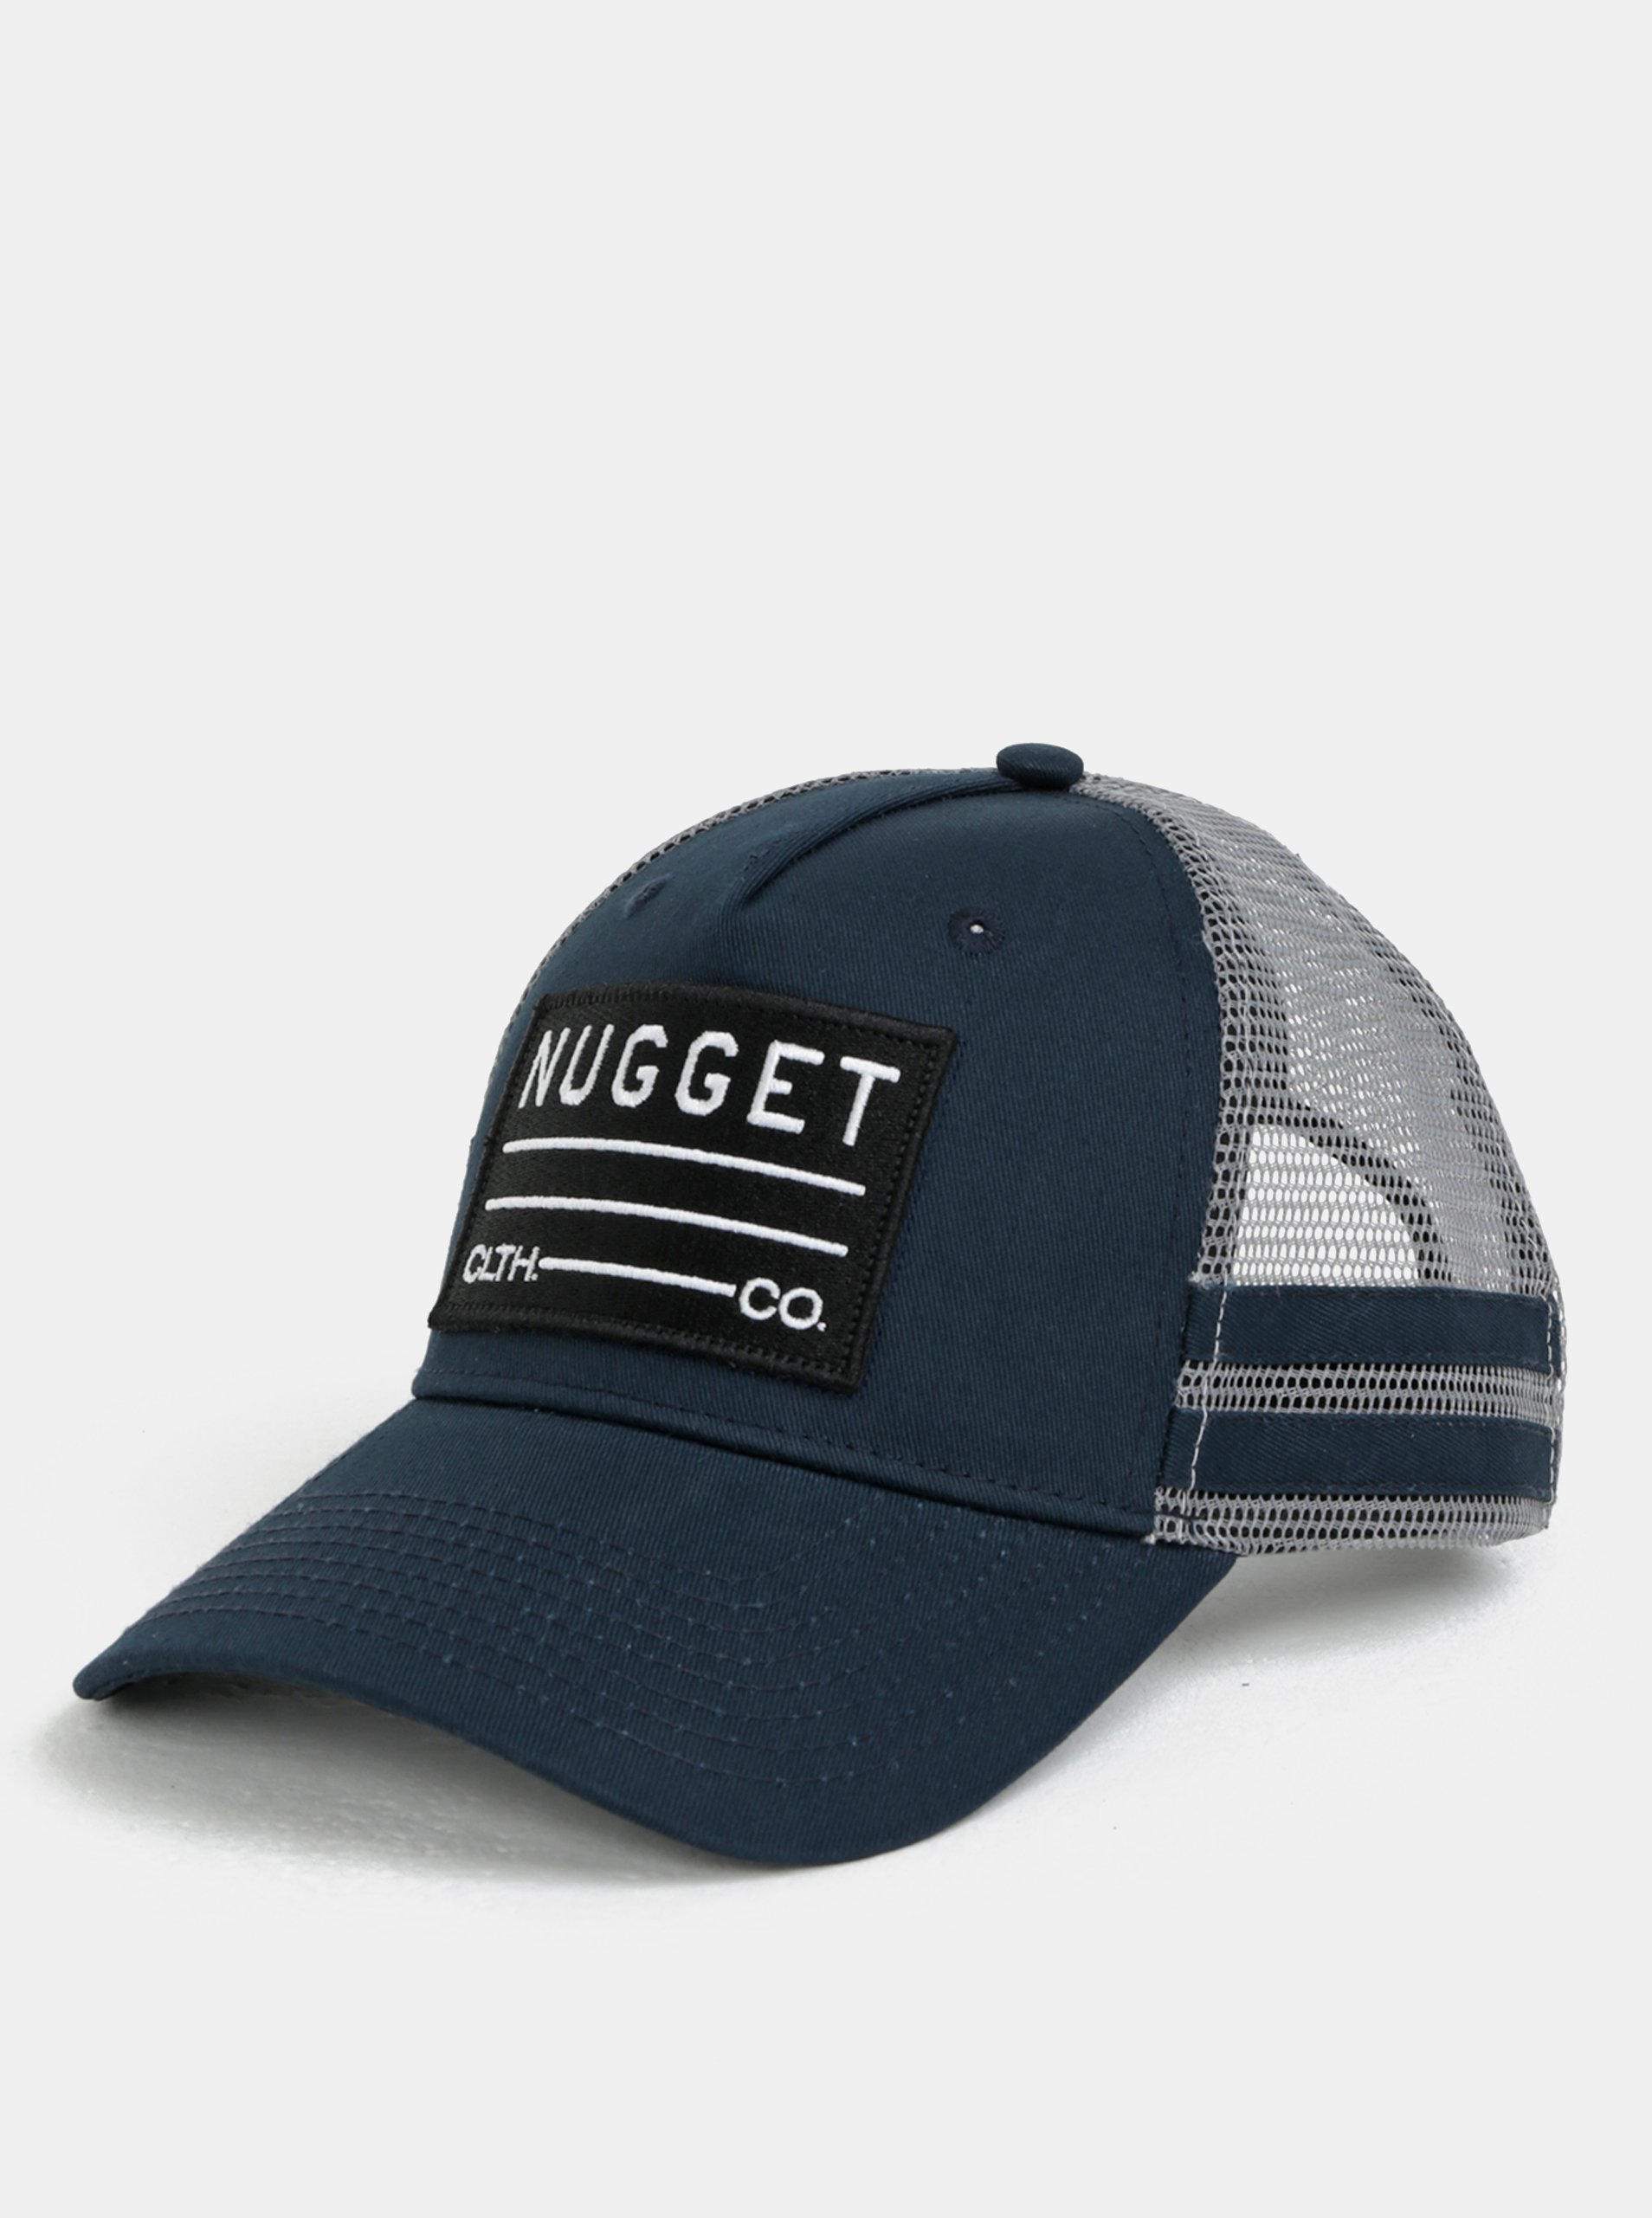 Tmavomodrá pánska šiltovka NUGGET Slope